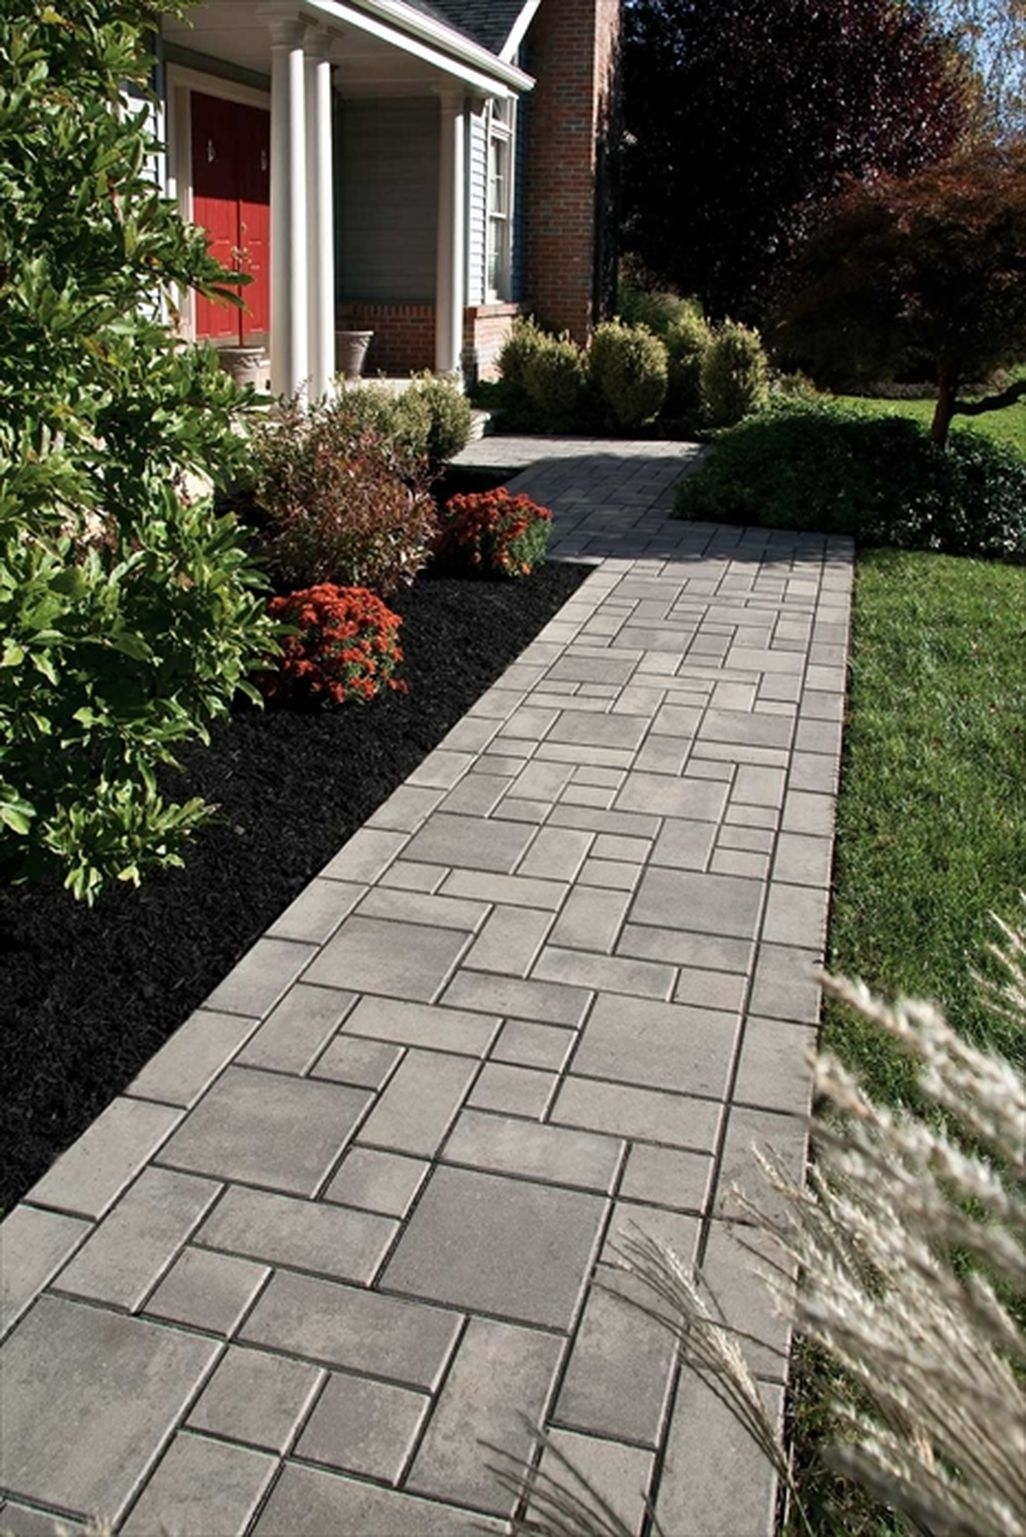 Stunning Front Yard Walkway Landscaping Design Ideas 30